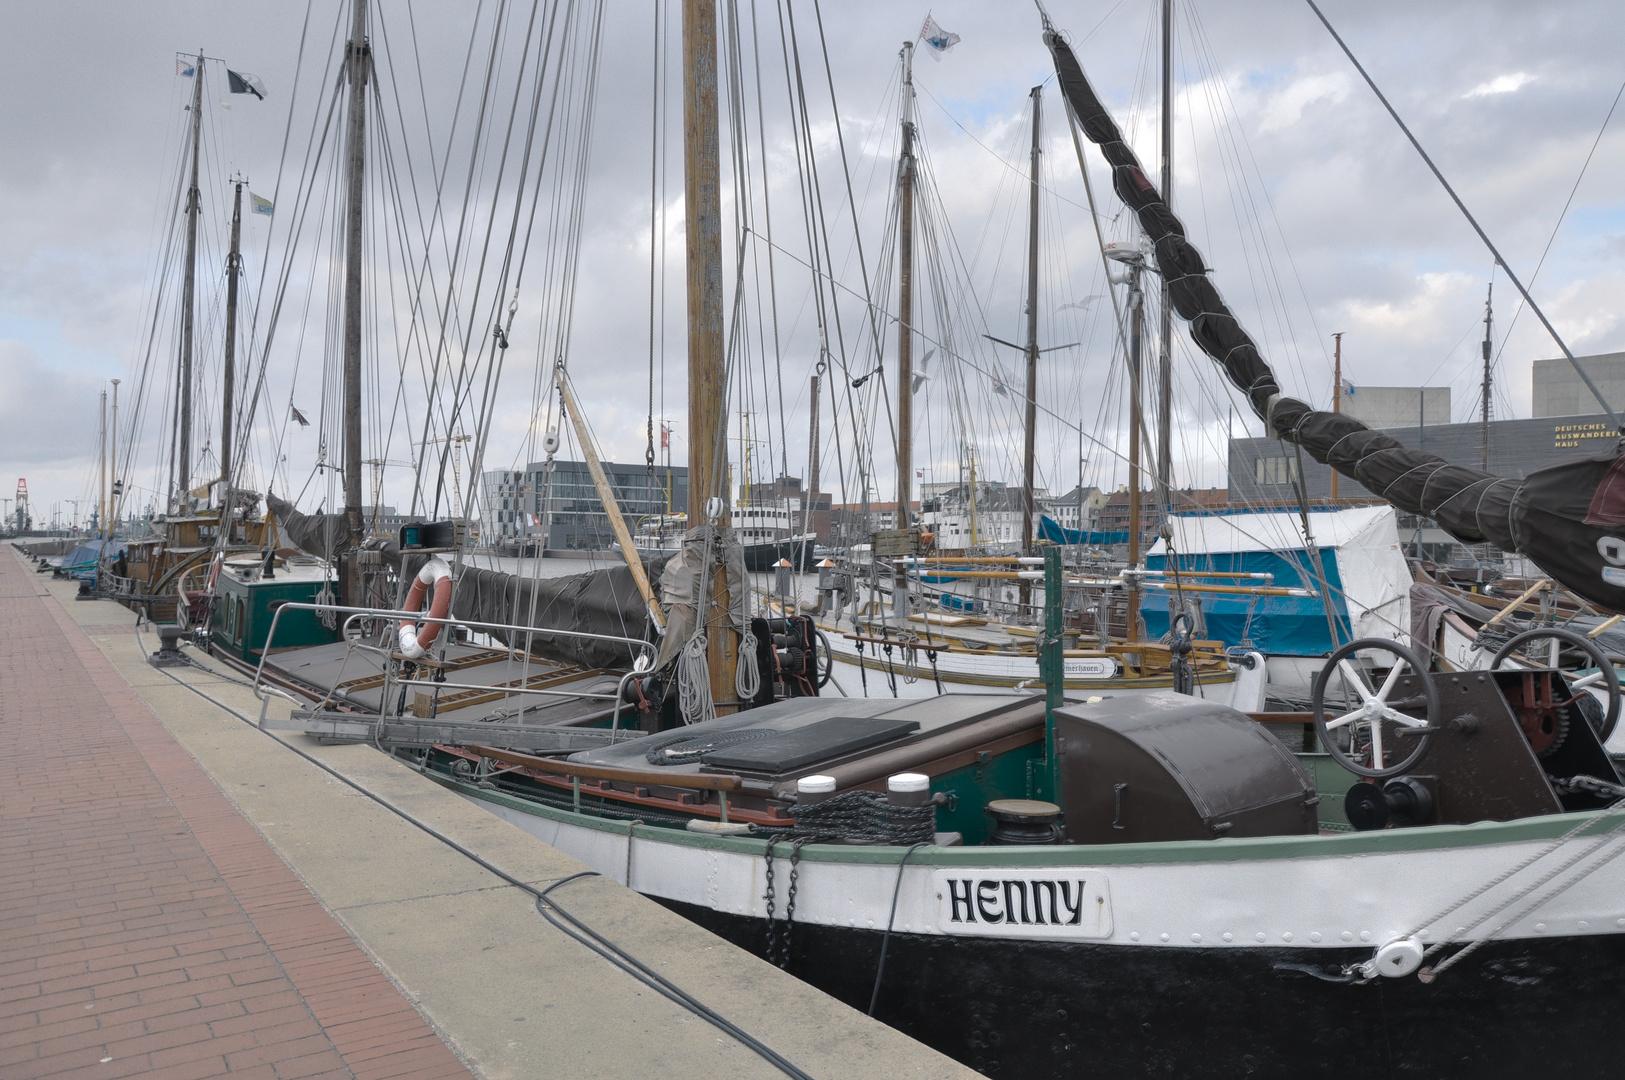 HDR - Segelschiffe